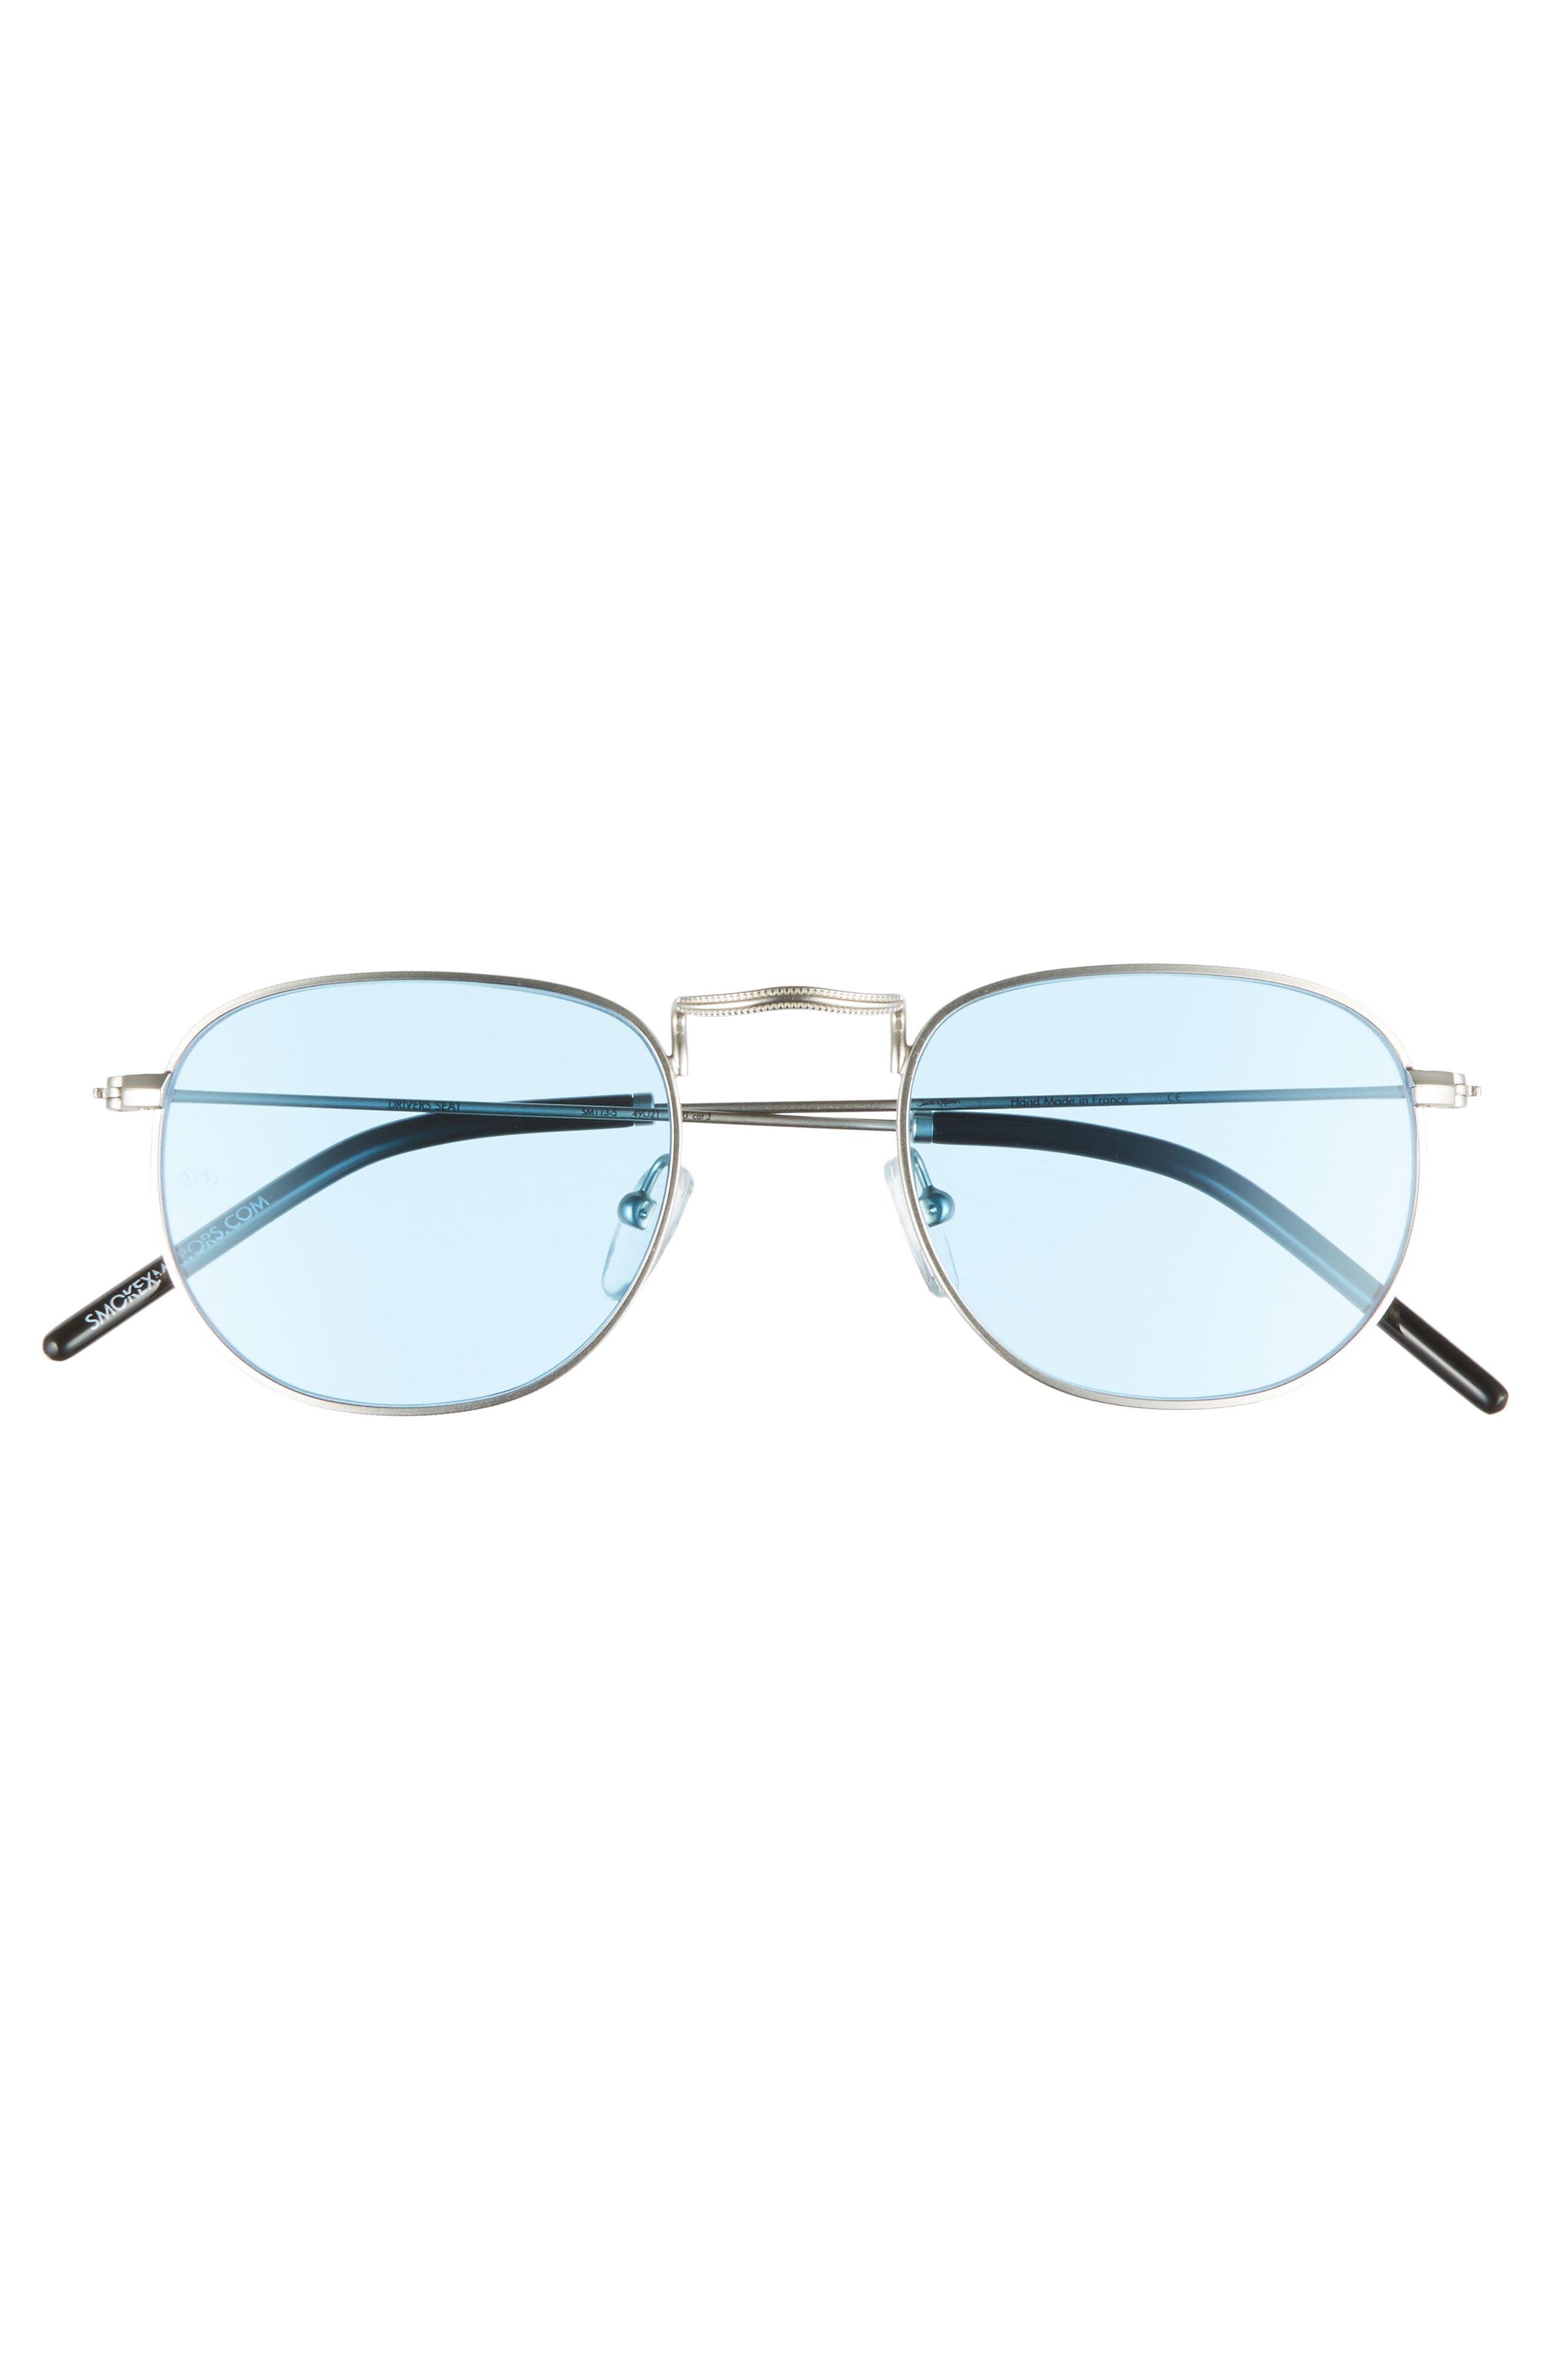 Driver's Seat 49mm Sunglasses,                             Alternate thumbnail 2, color,                             SILVER/ TRANSPARENT BLUE